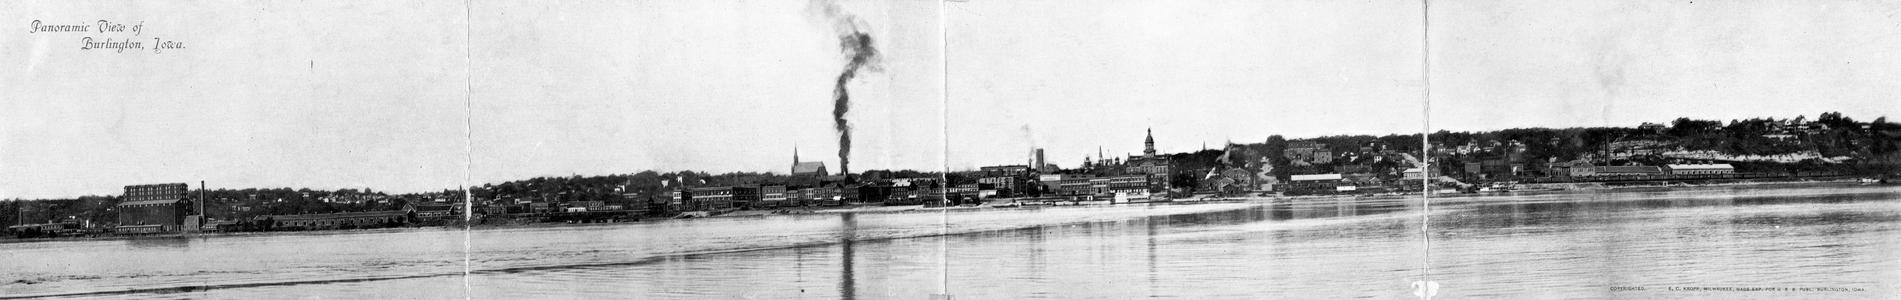 Panoramic View of Burlington, Iowa